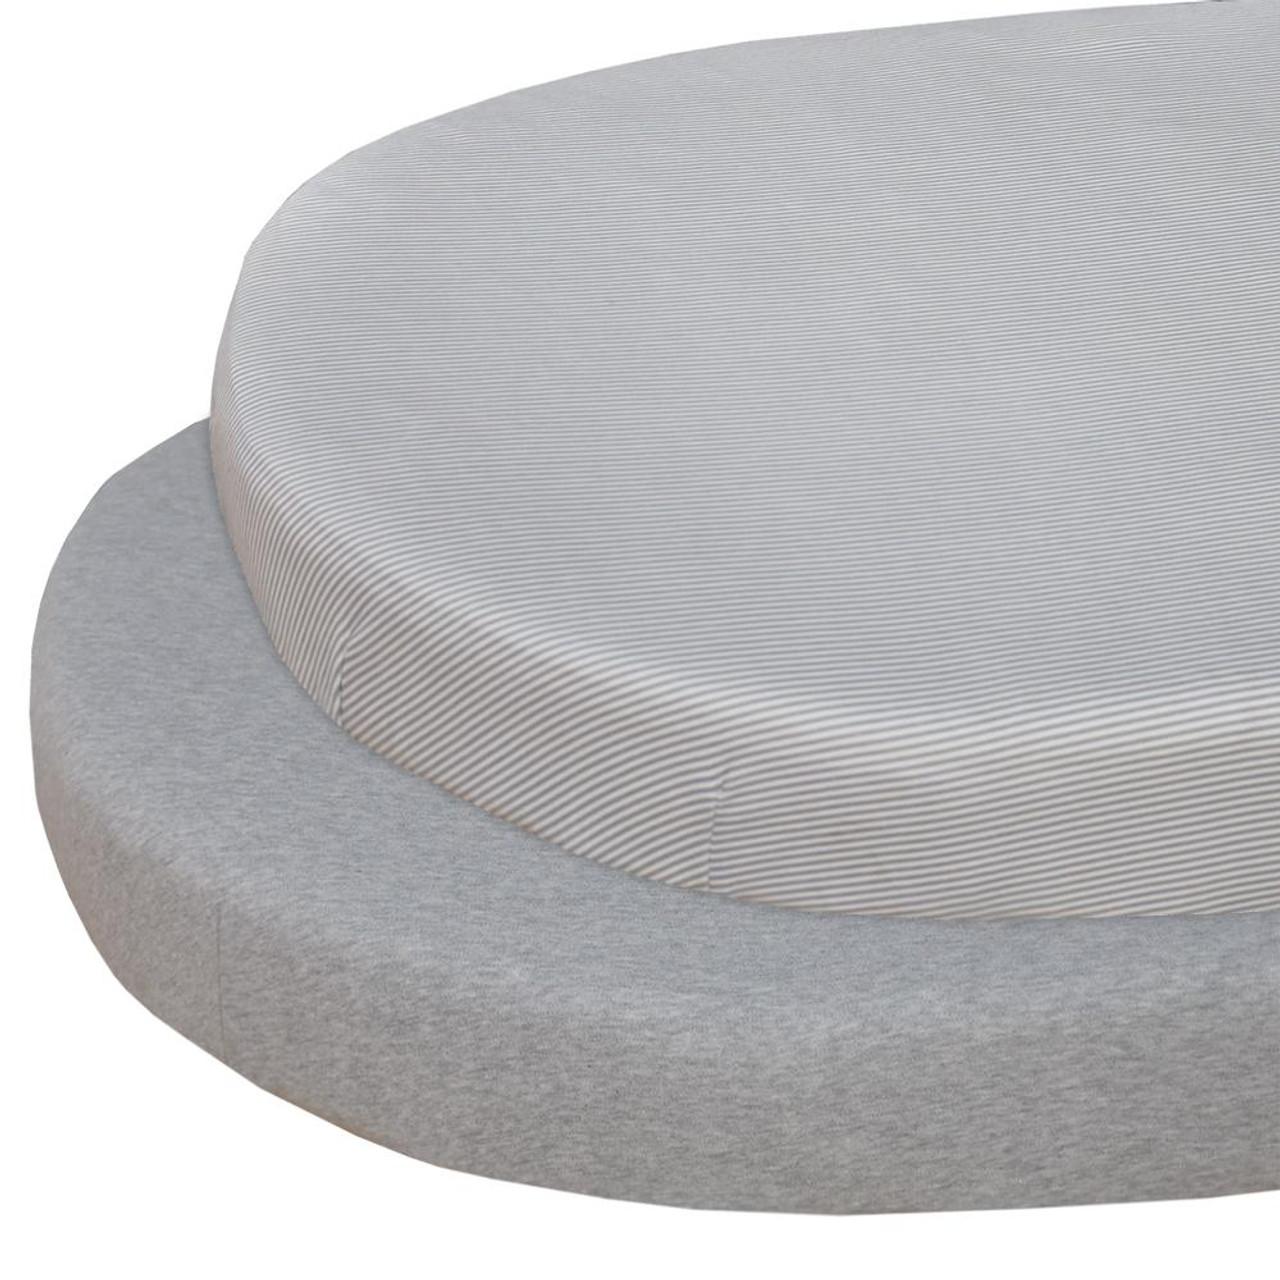 The Living Textiles 2 pk Cotton Jersey Round Cot Sheet Grey & Stripe